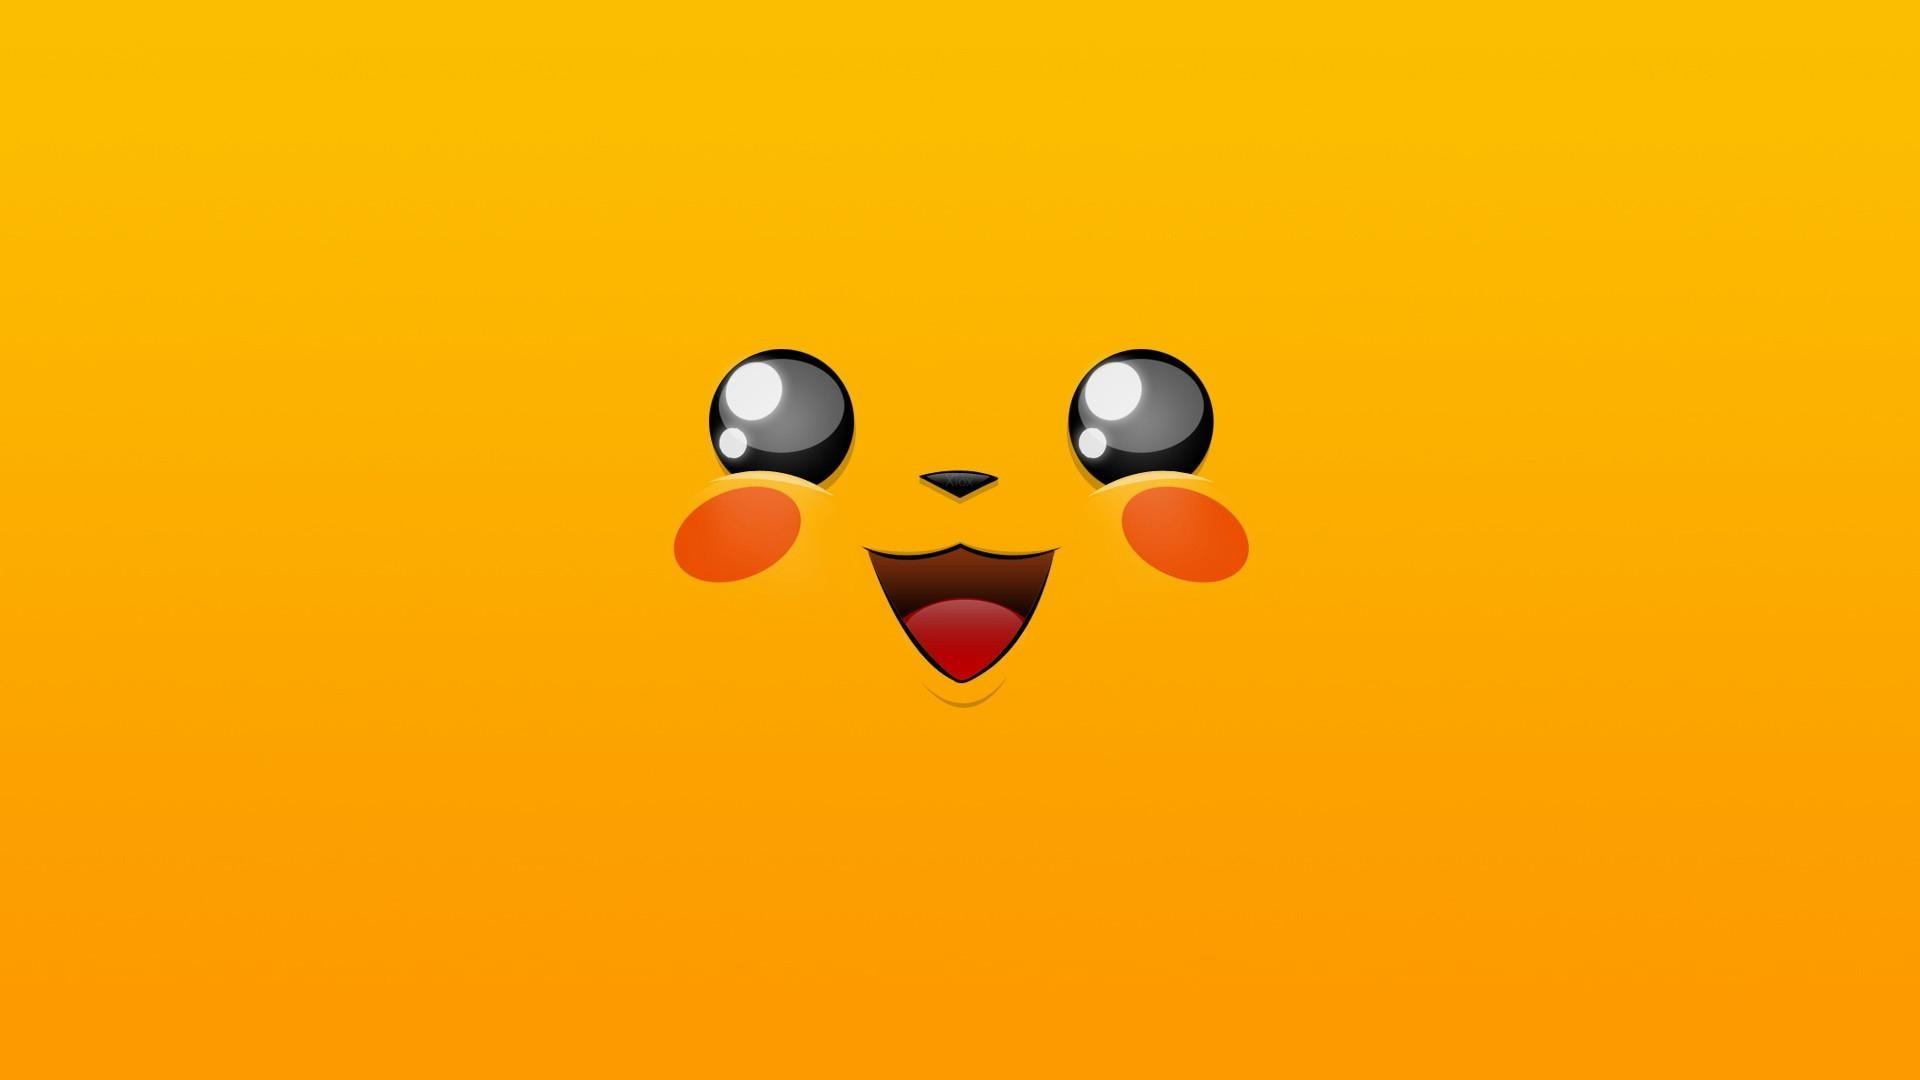 Pikachu-wallpaper-hd-background